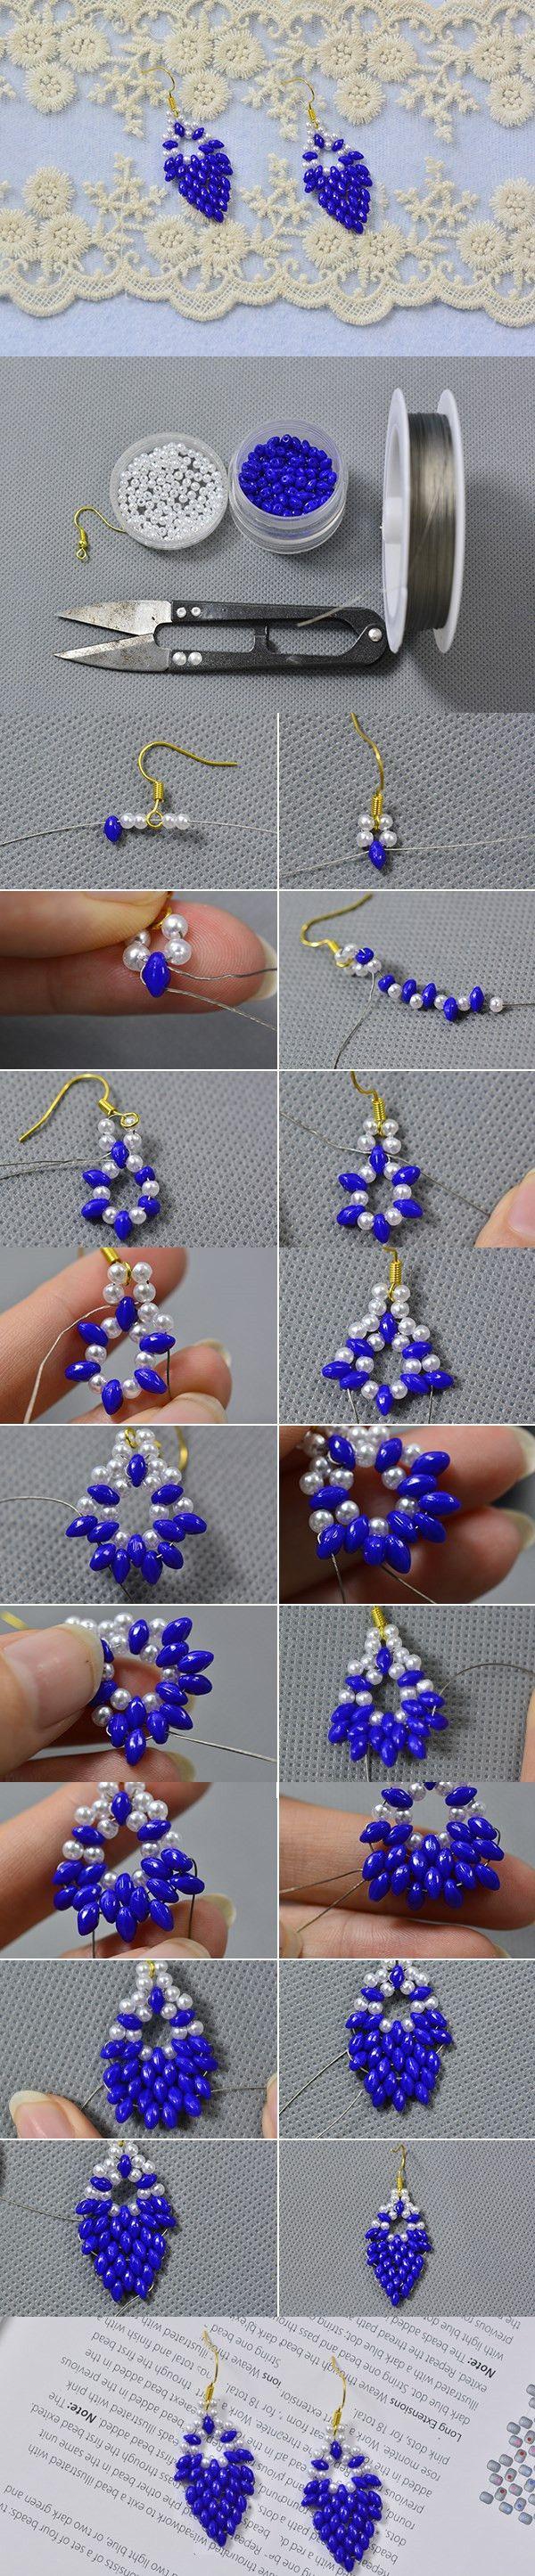 DIY Purple Bead Earrings with Seed Beads and Pearl Beads